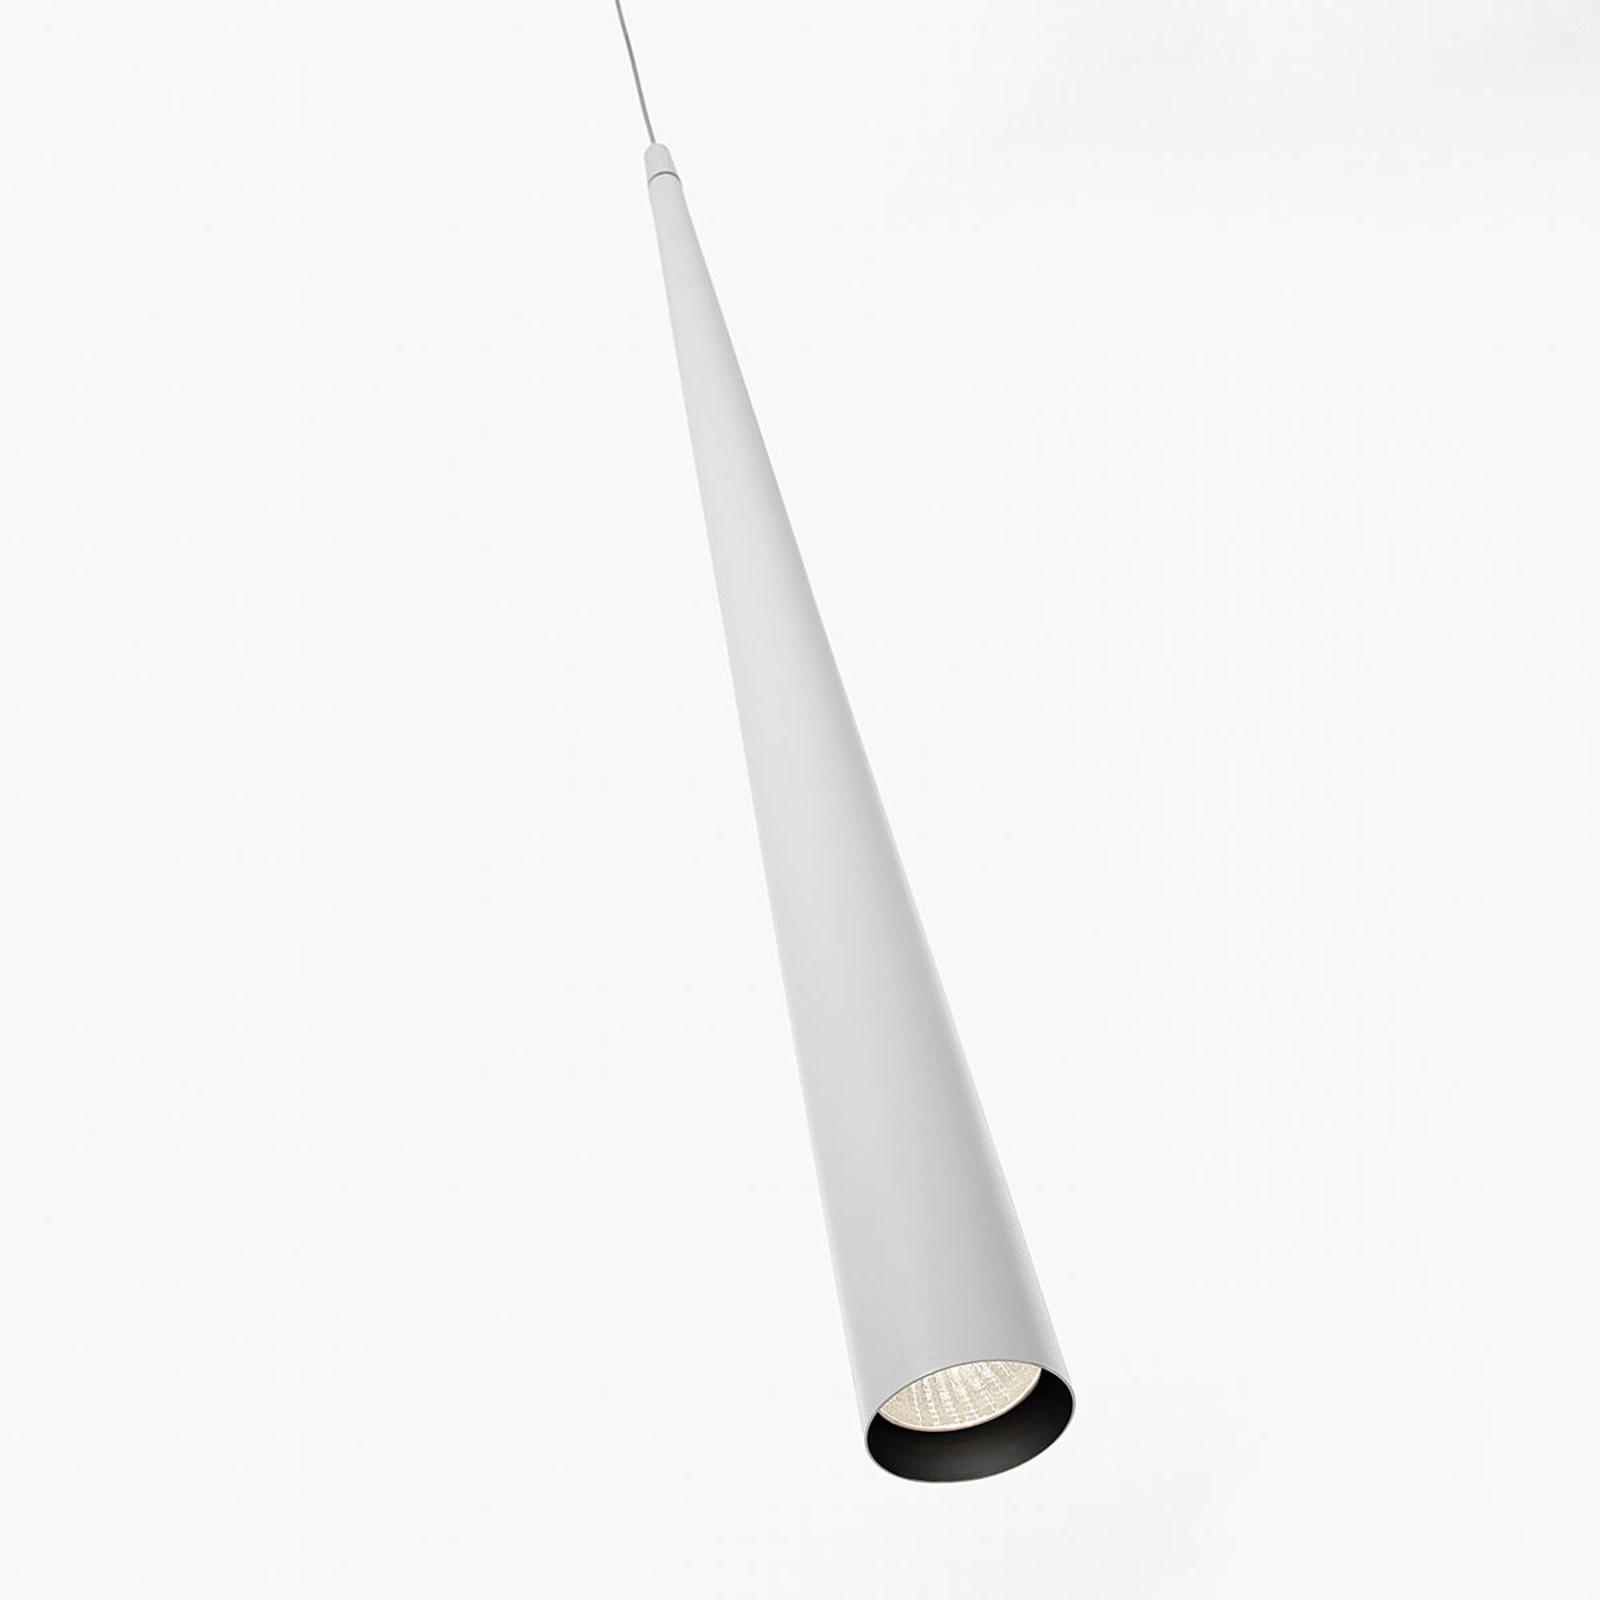 Schmale LED-Pendelleuchte Micro S50, weiß